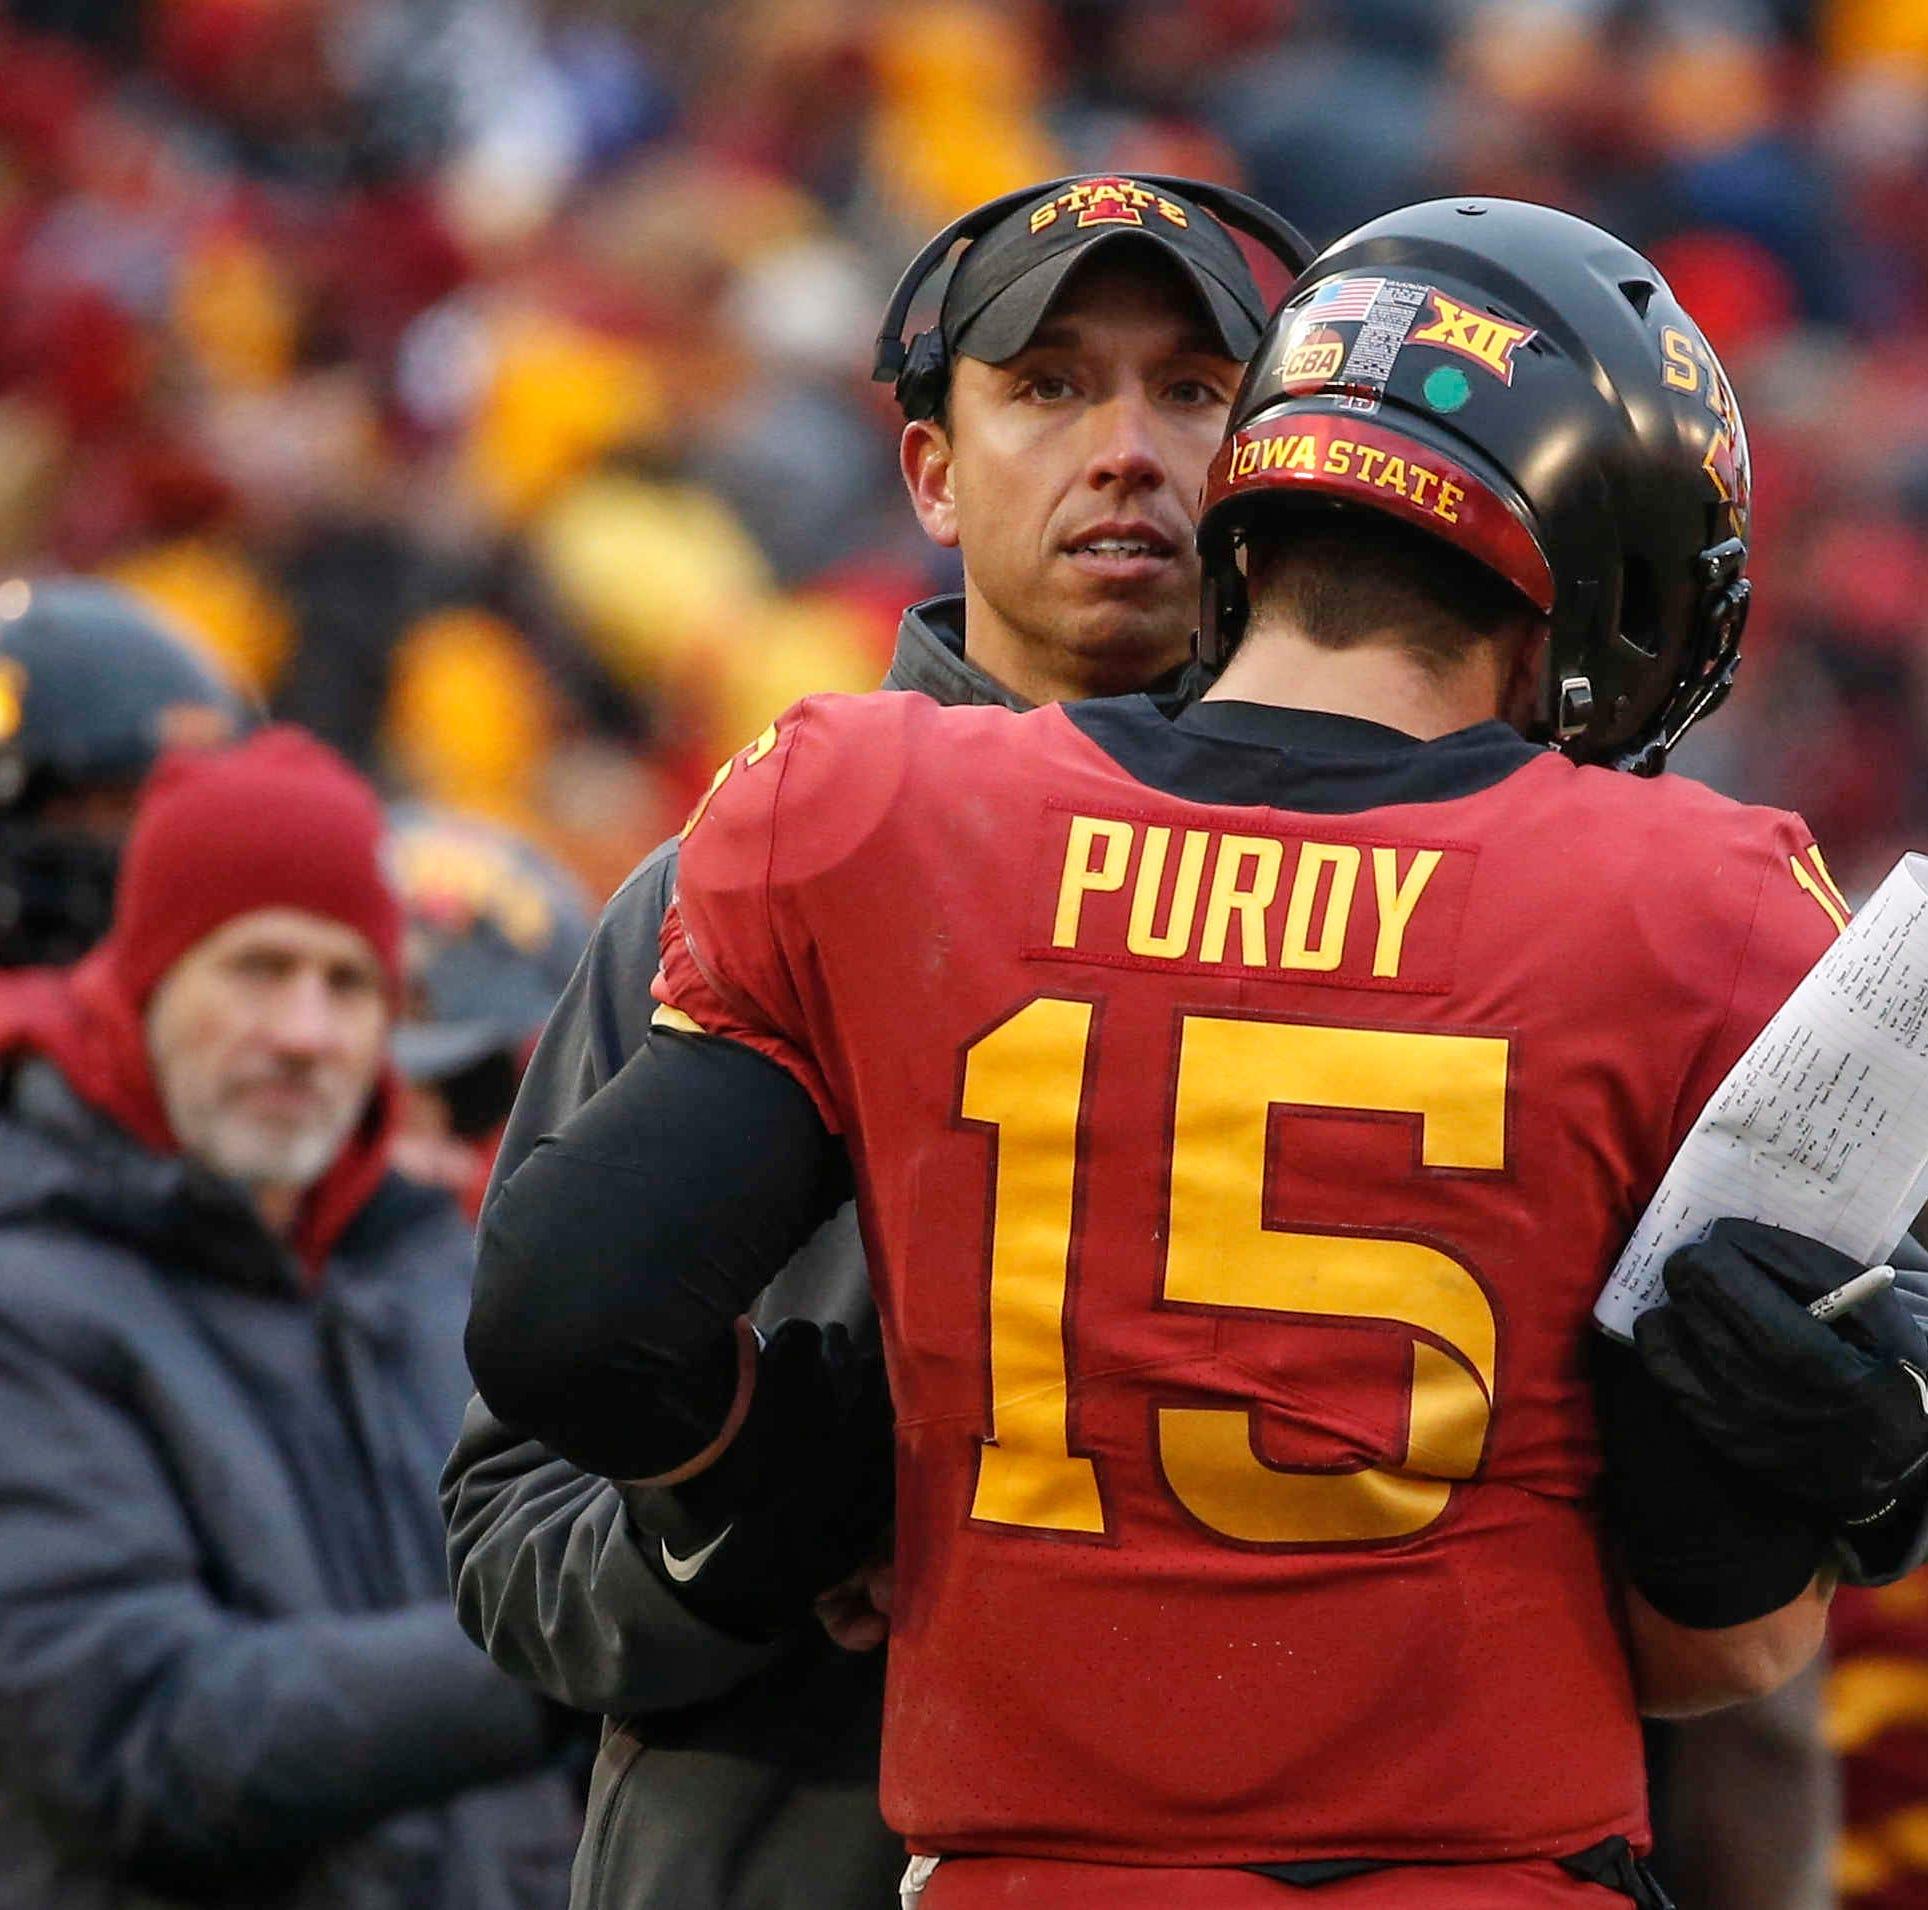 Iowa State adds a Kolar and a quarterback